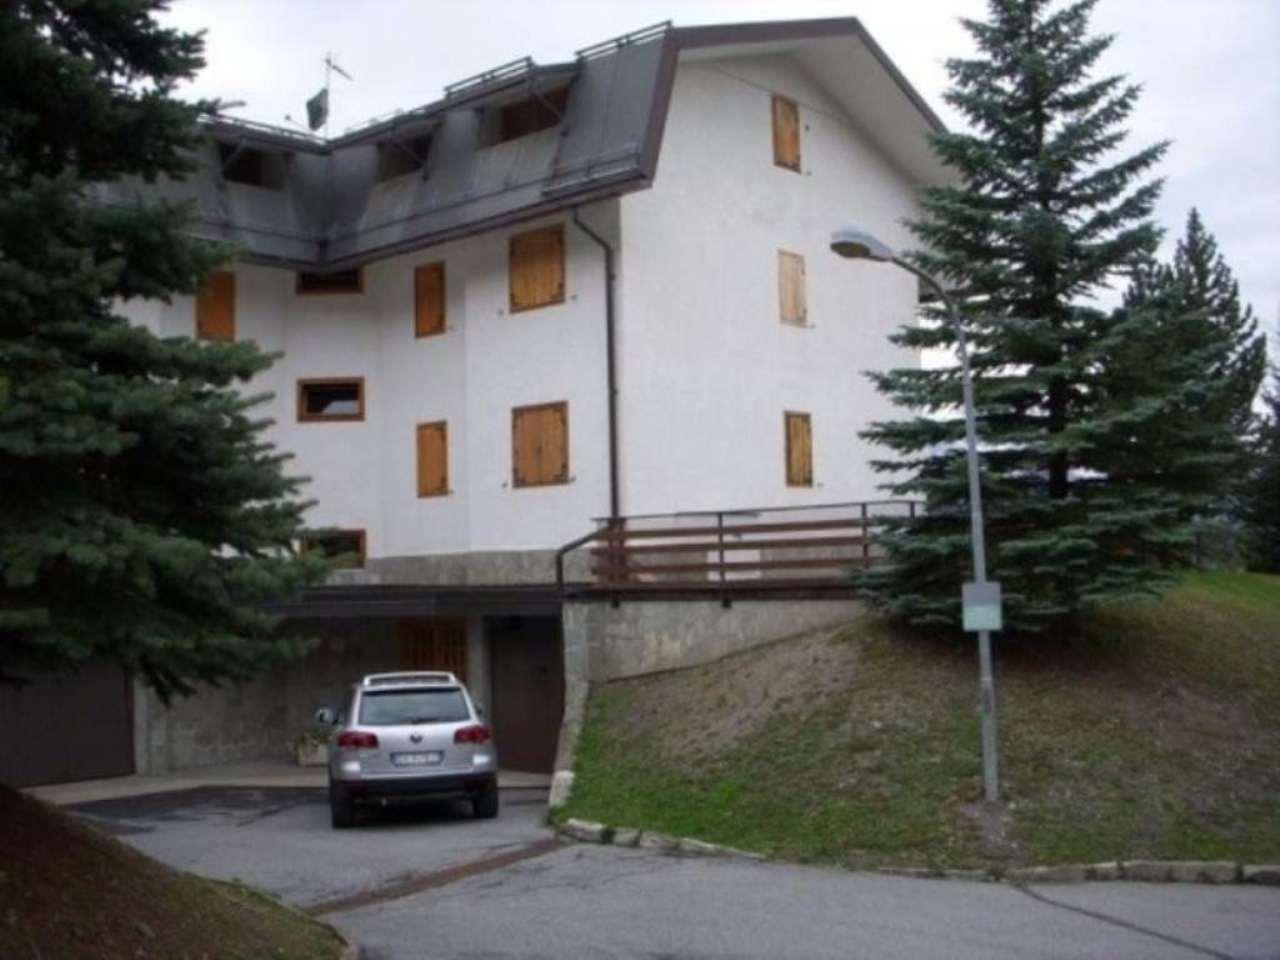 Appartamento in vendita a Sauze d'Oulx, 3 locali, Trattative riservate | Cambio Casa.it